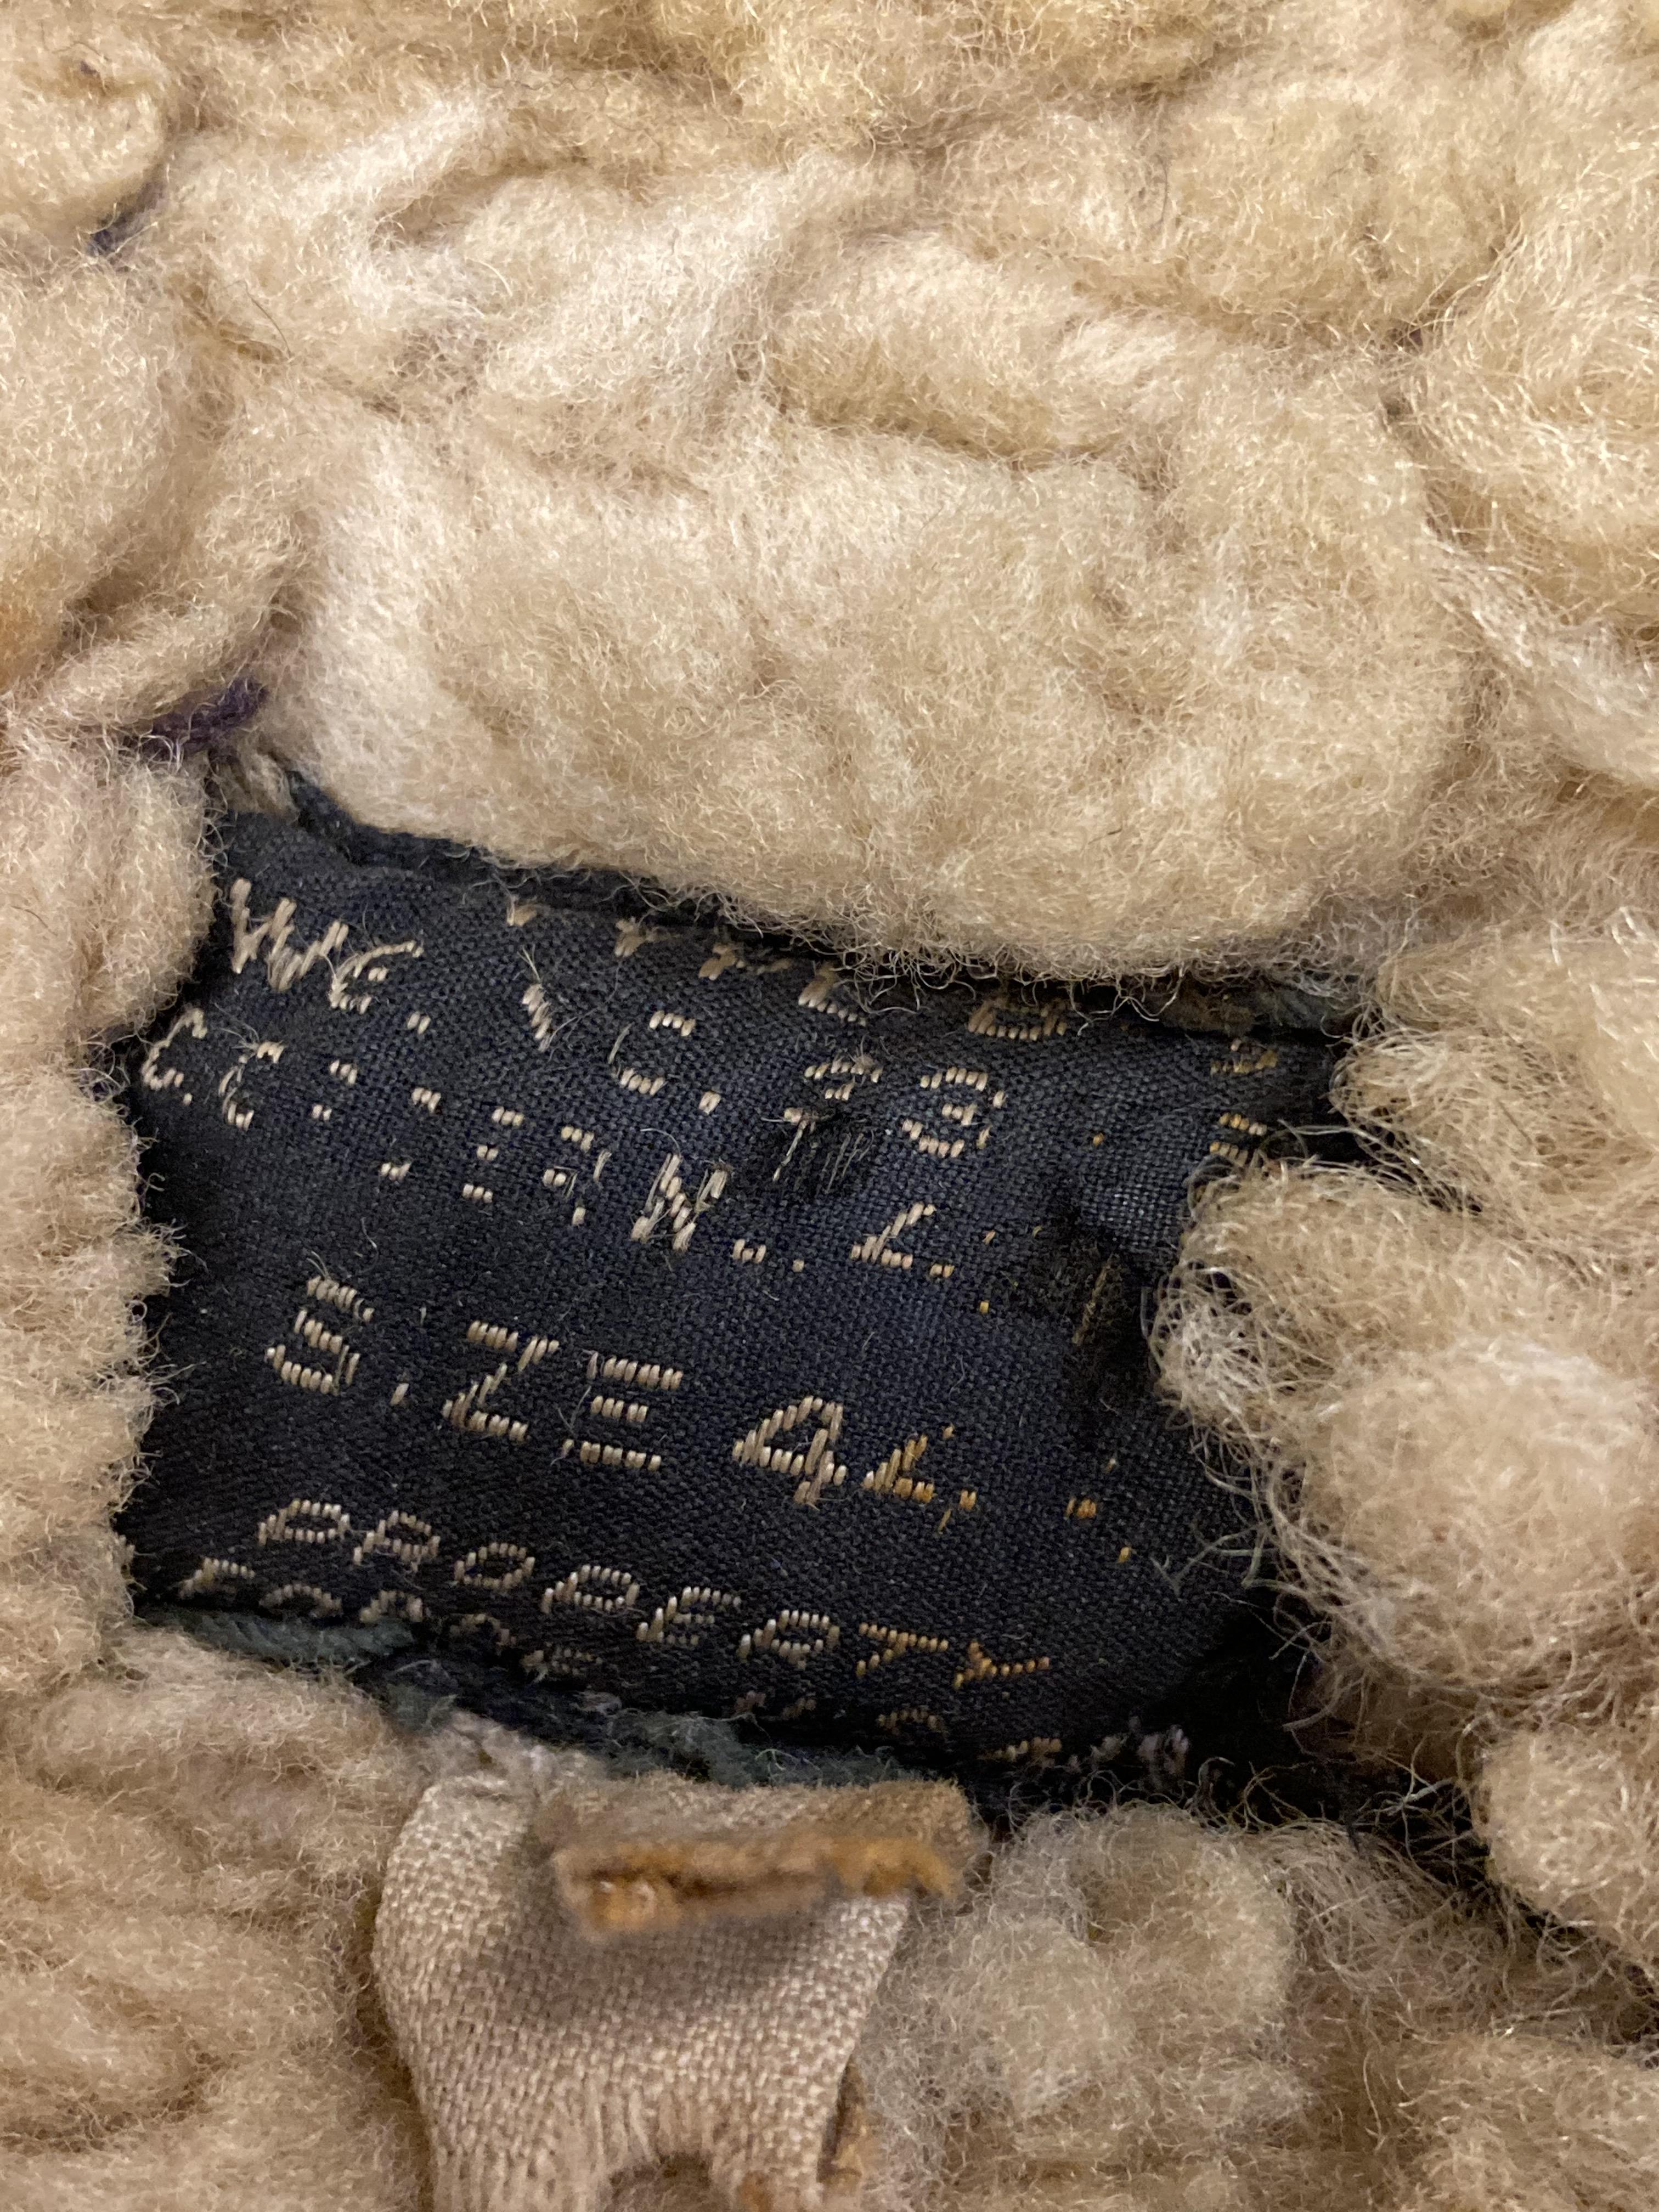 * Flying Jacket. WWII USAAF brown leather flying jacket - Image 2 of 3